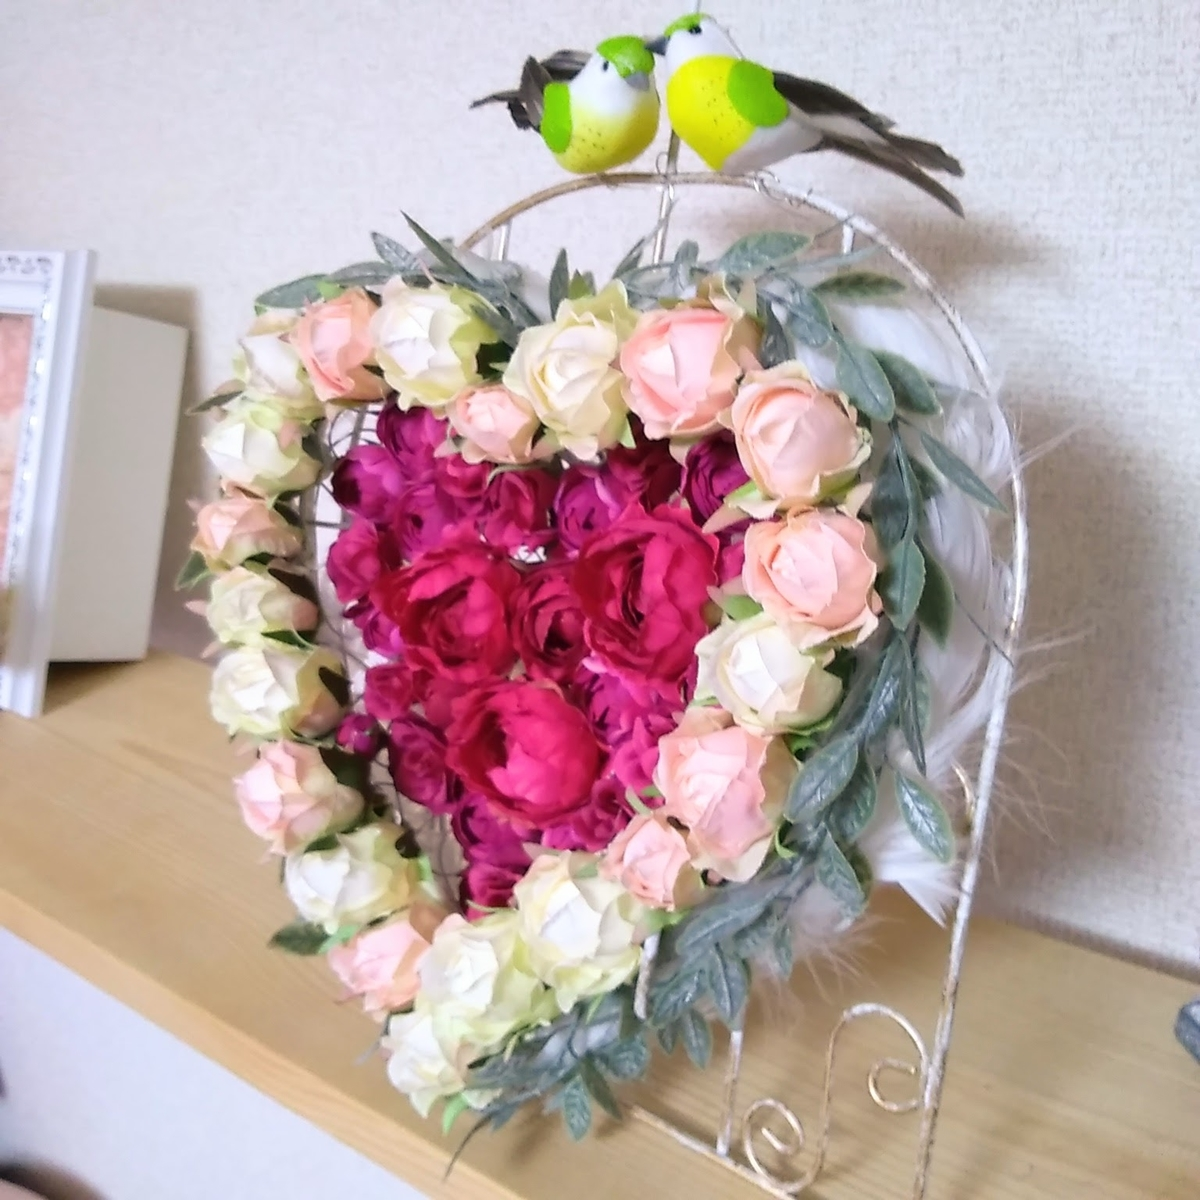 f:id:joresuto:20190328184143j:plain